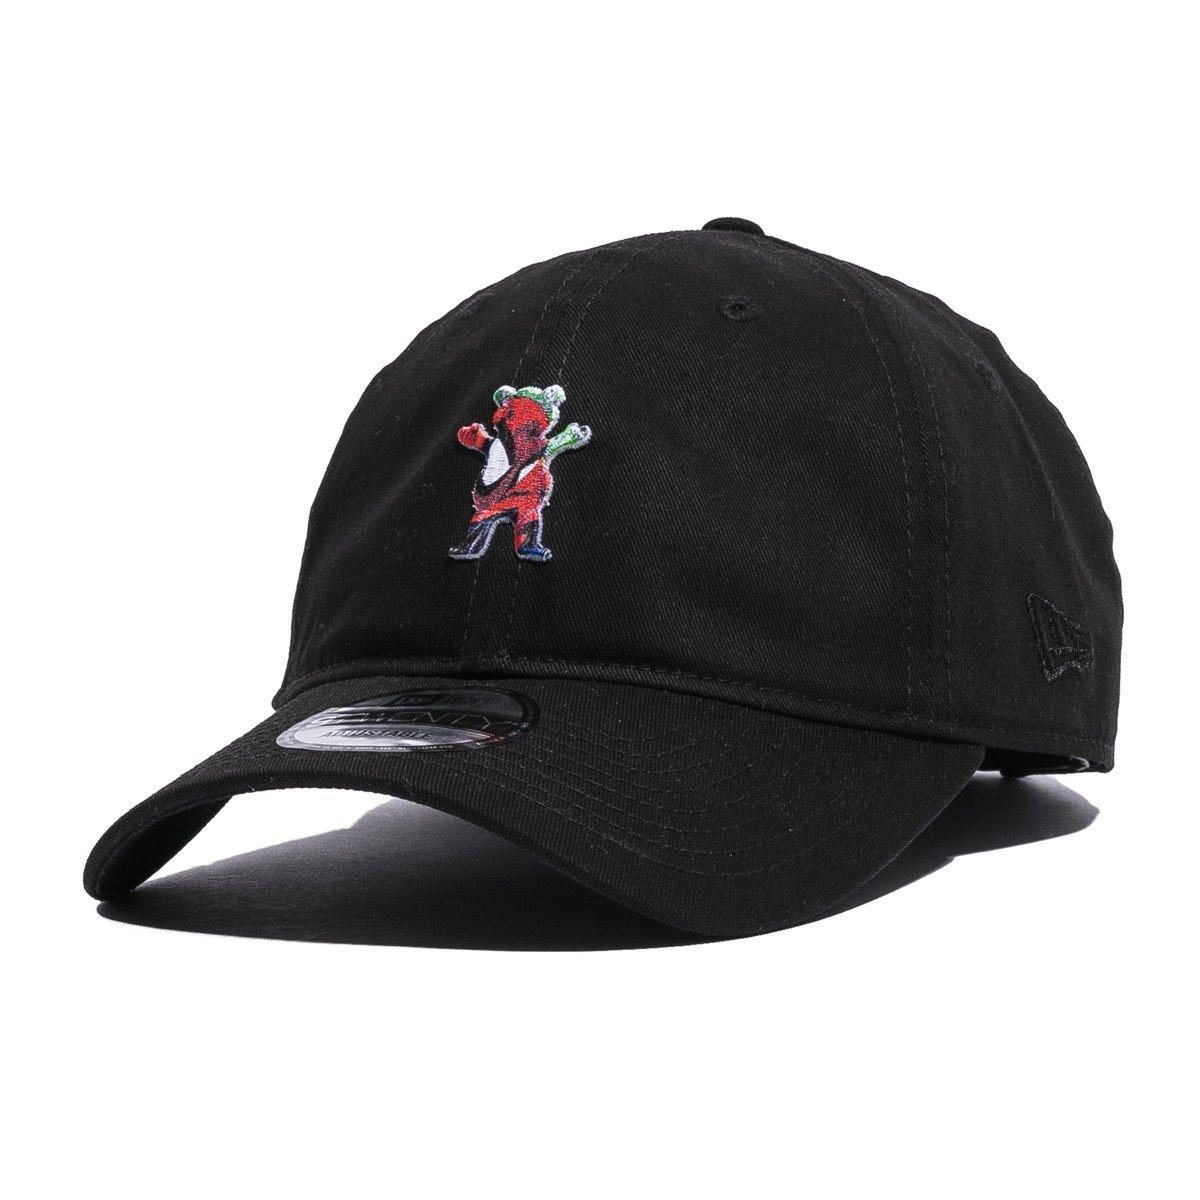 czapka grizzly x spiderman dad hat black Click to zoom ... ec78fdc939b